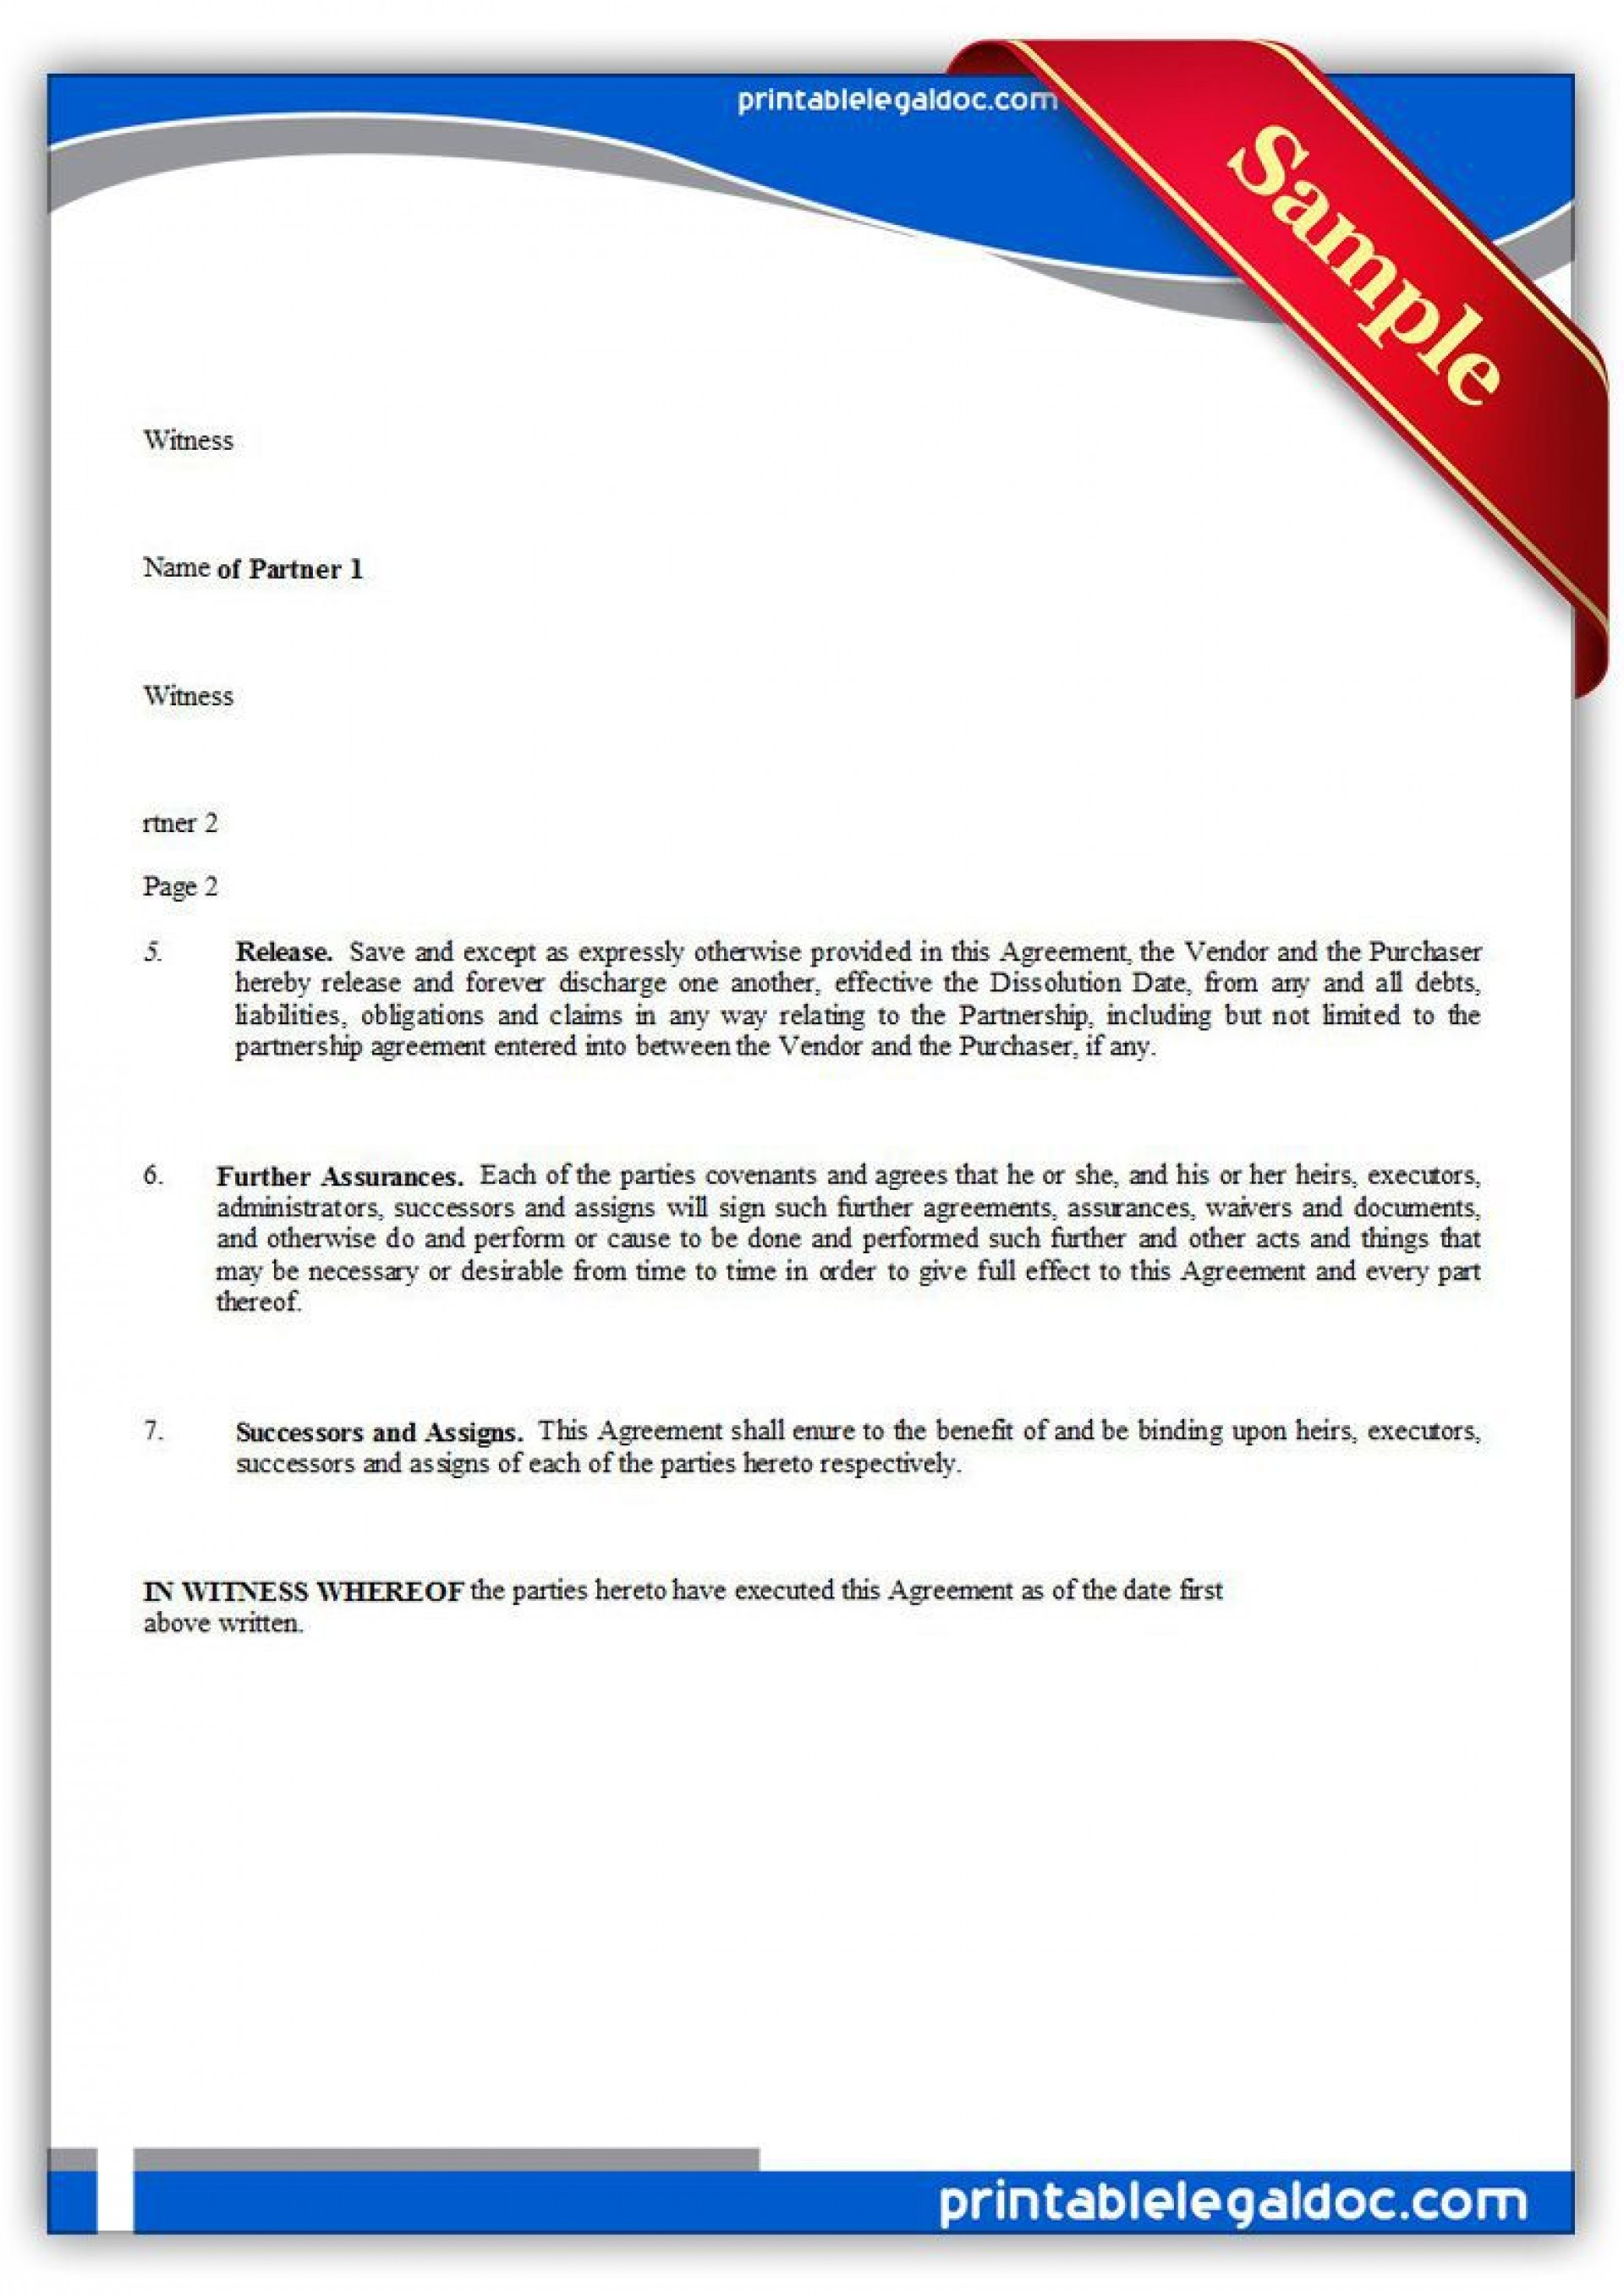 001 Marvelou Busines Partnership Separation Agreement Template Highest Quality  Partner Termination1920